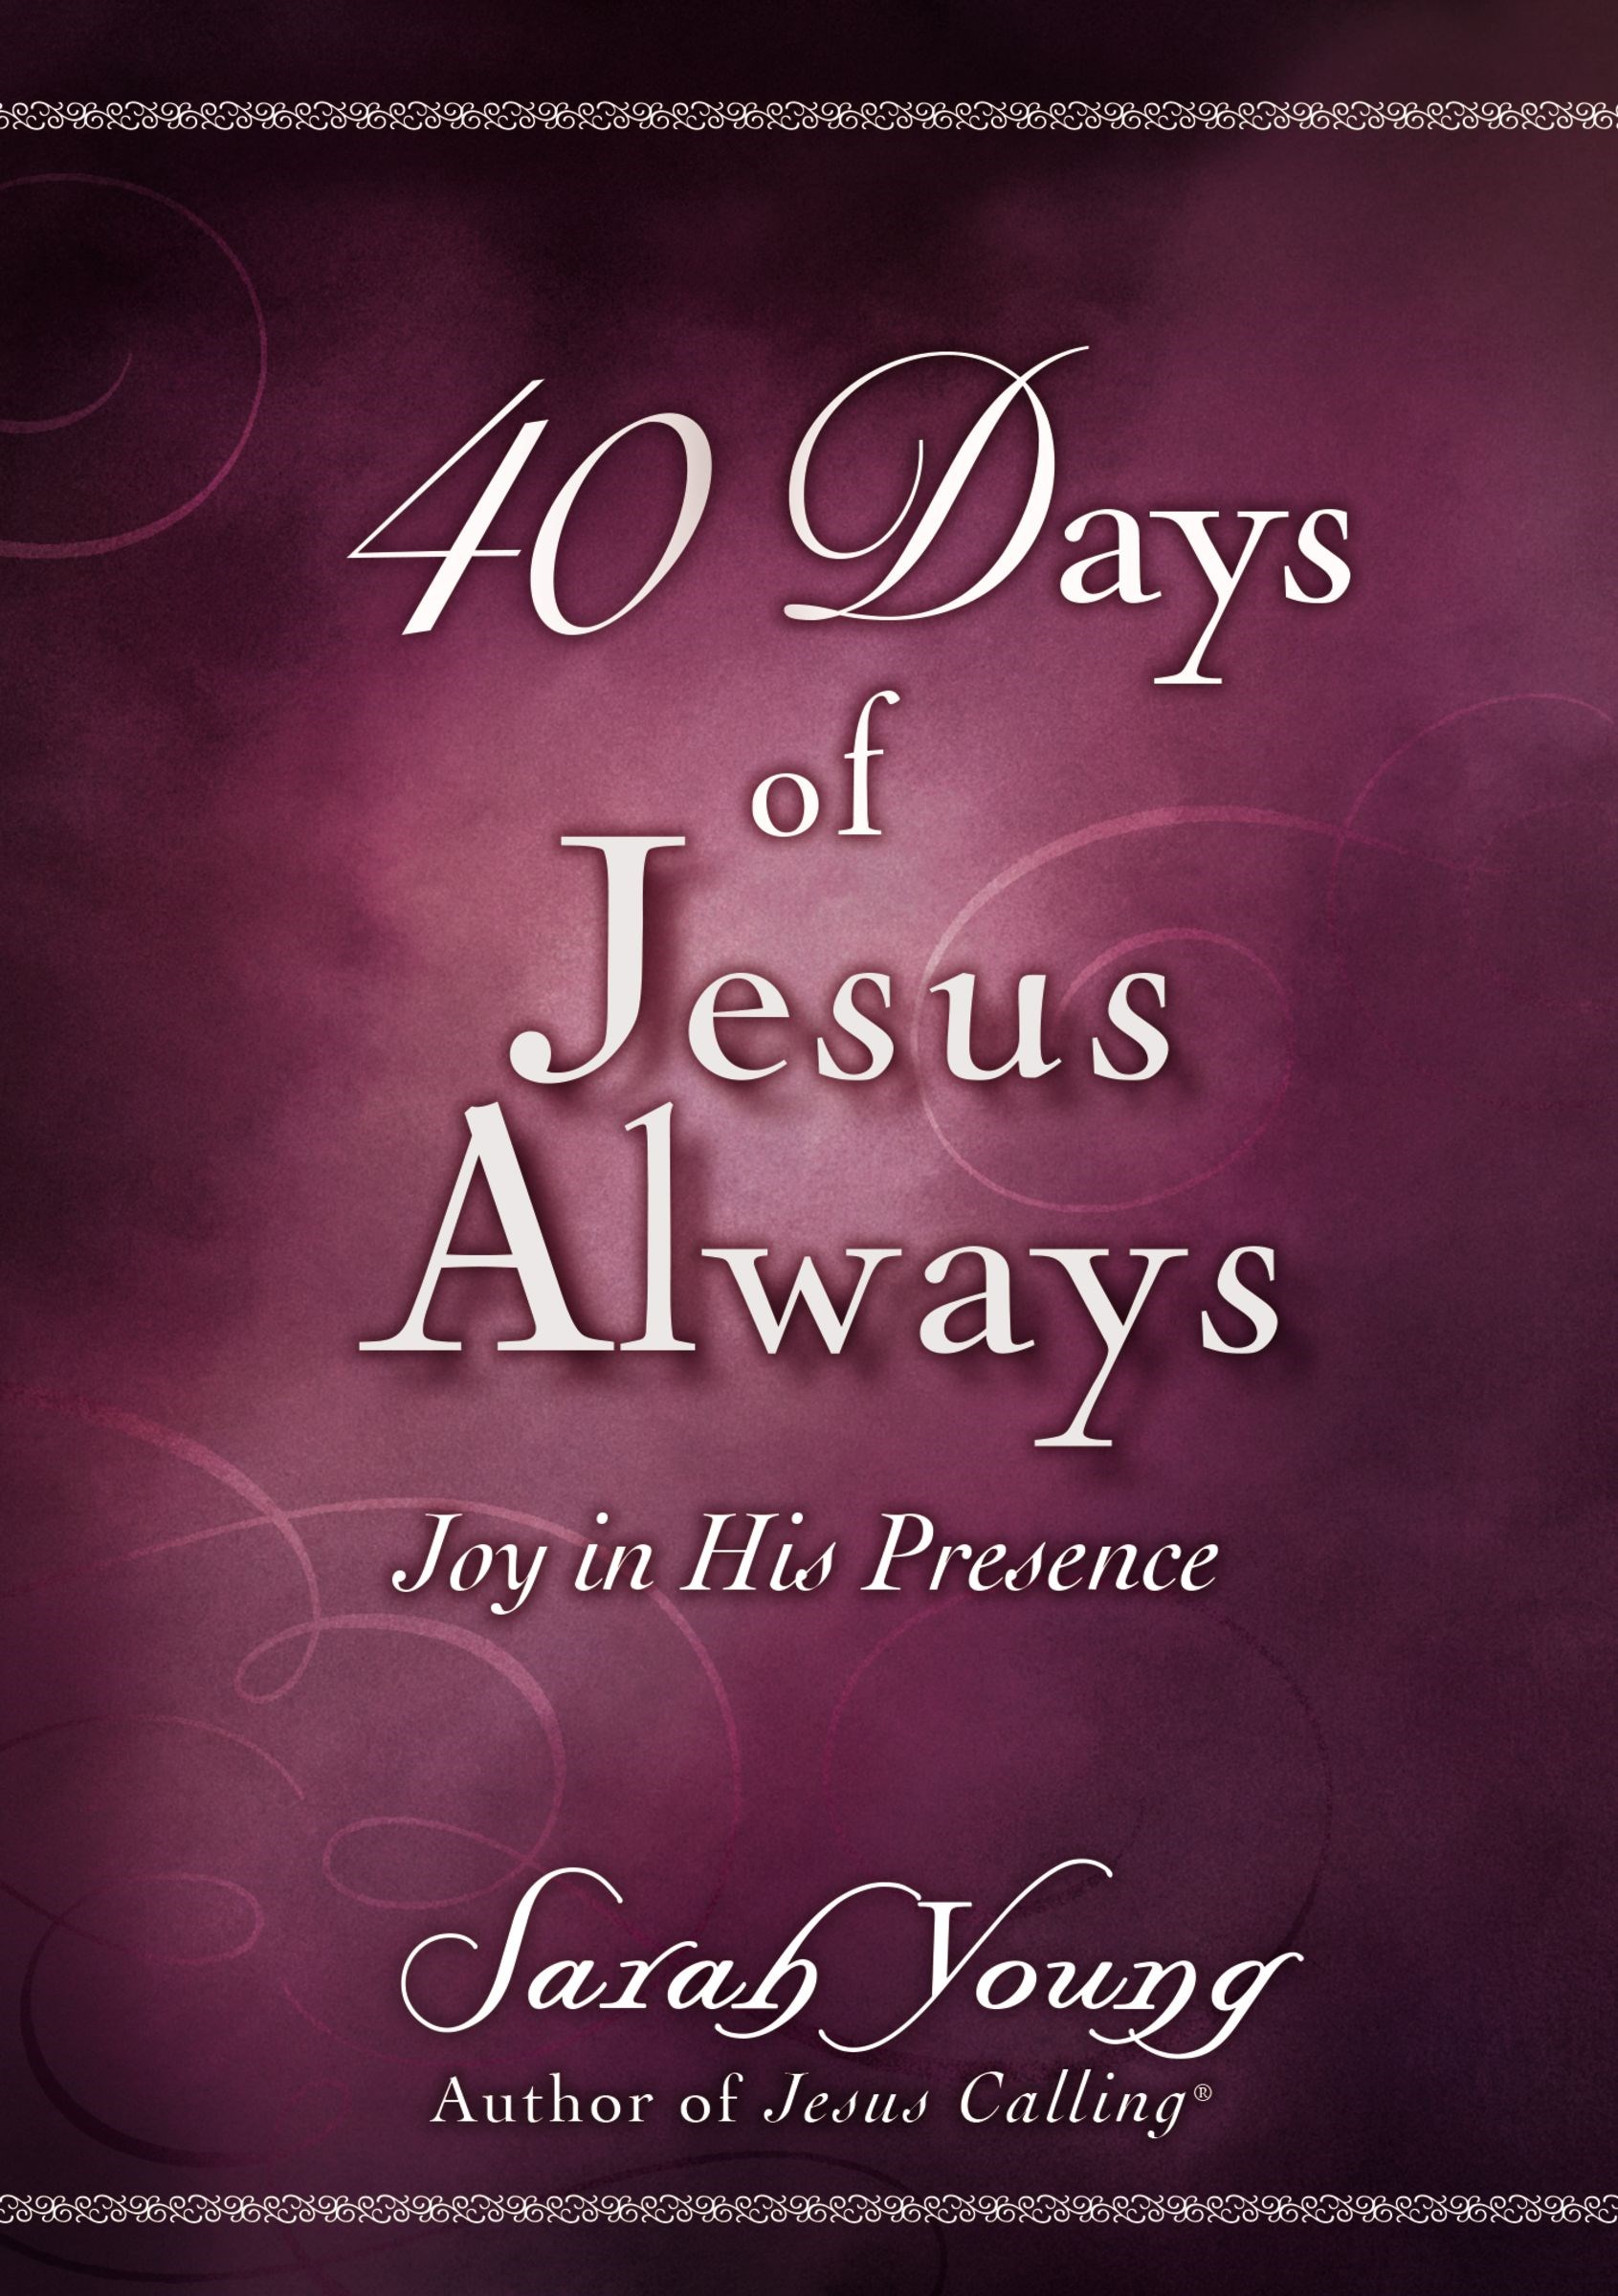 40 Days Of Jesus Always